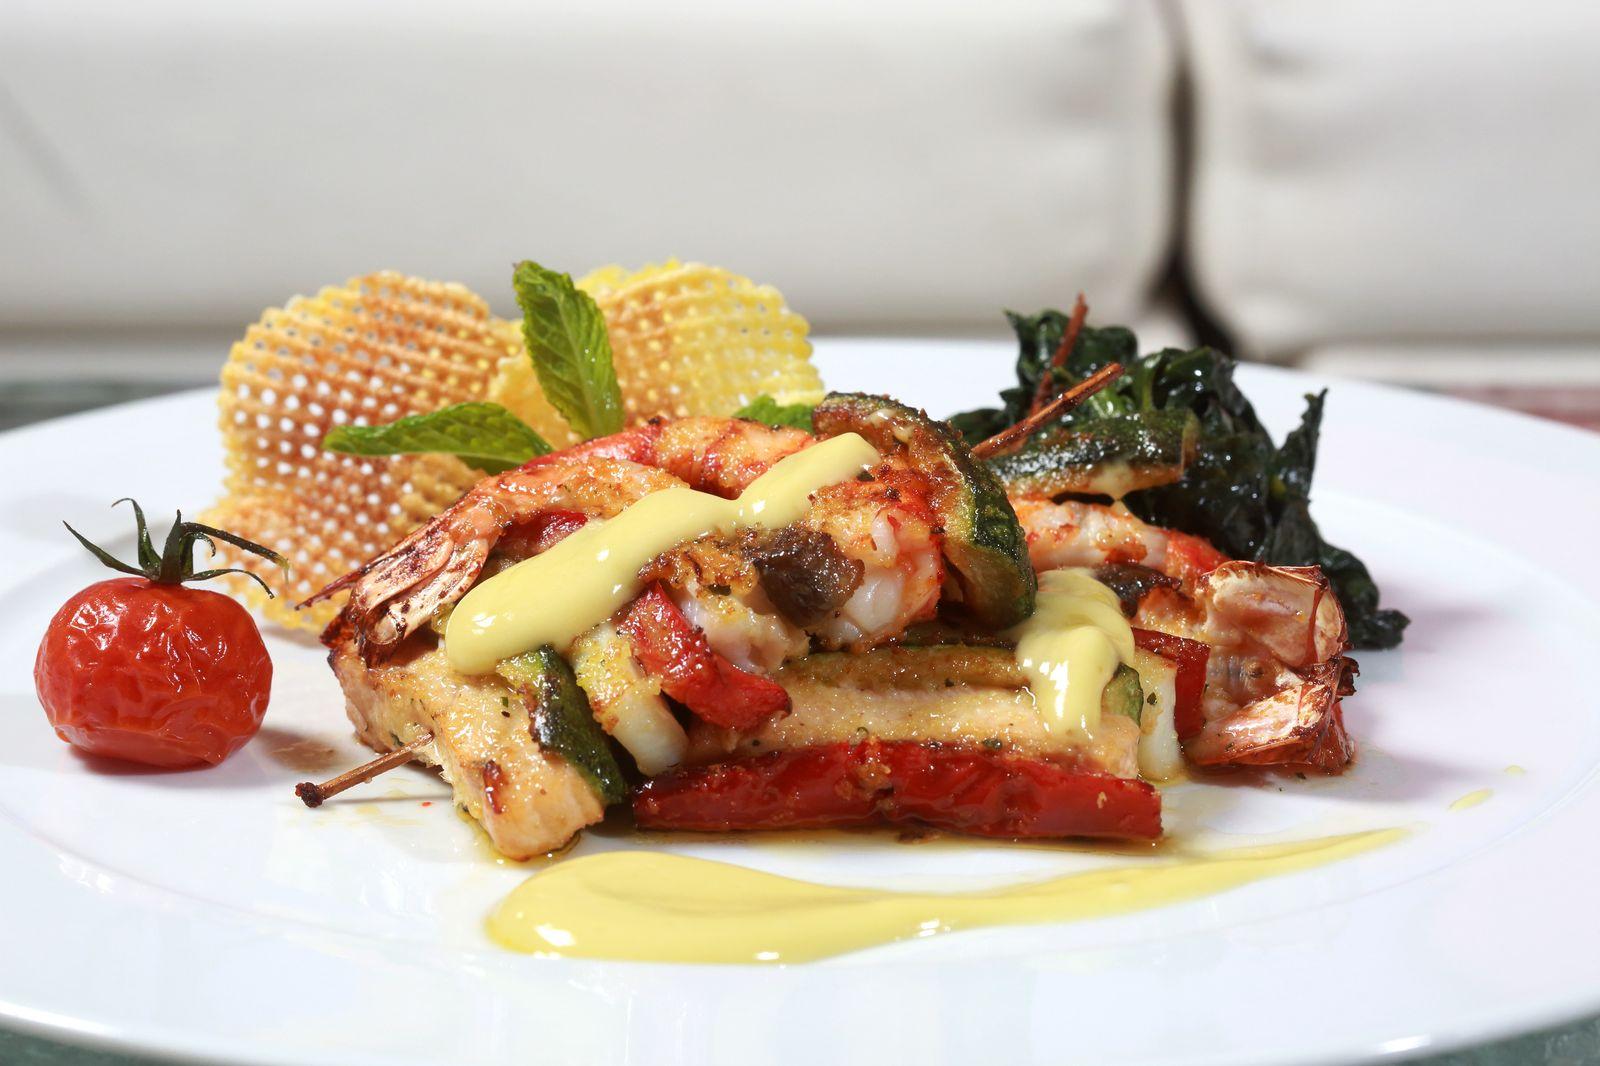 La Giara Restaurant e Banqueting - Sicily